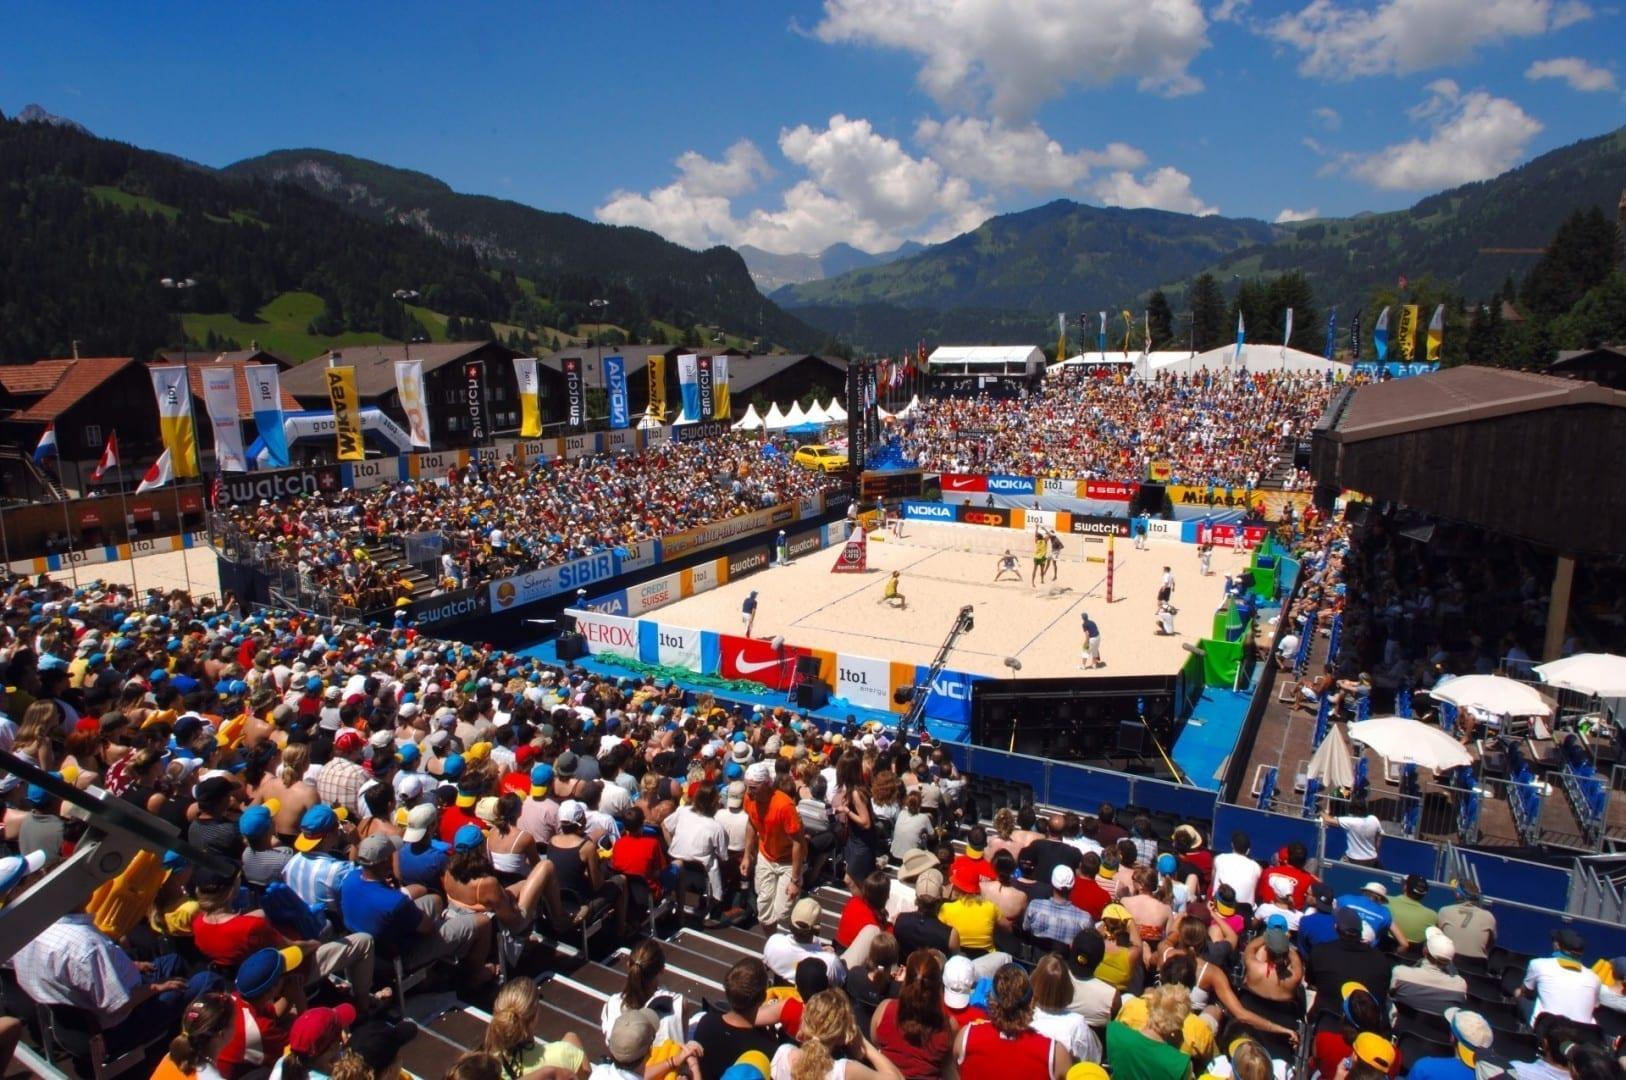 Torneo de voleibol de playa Gstaad-court: Roy Emerson Arena Gstaad Suiza